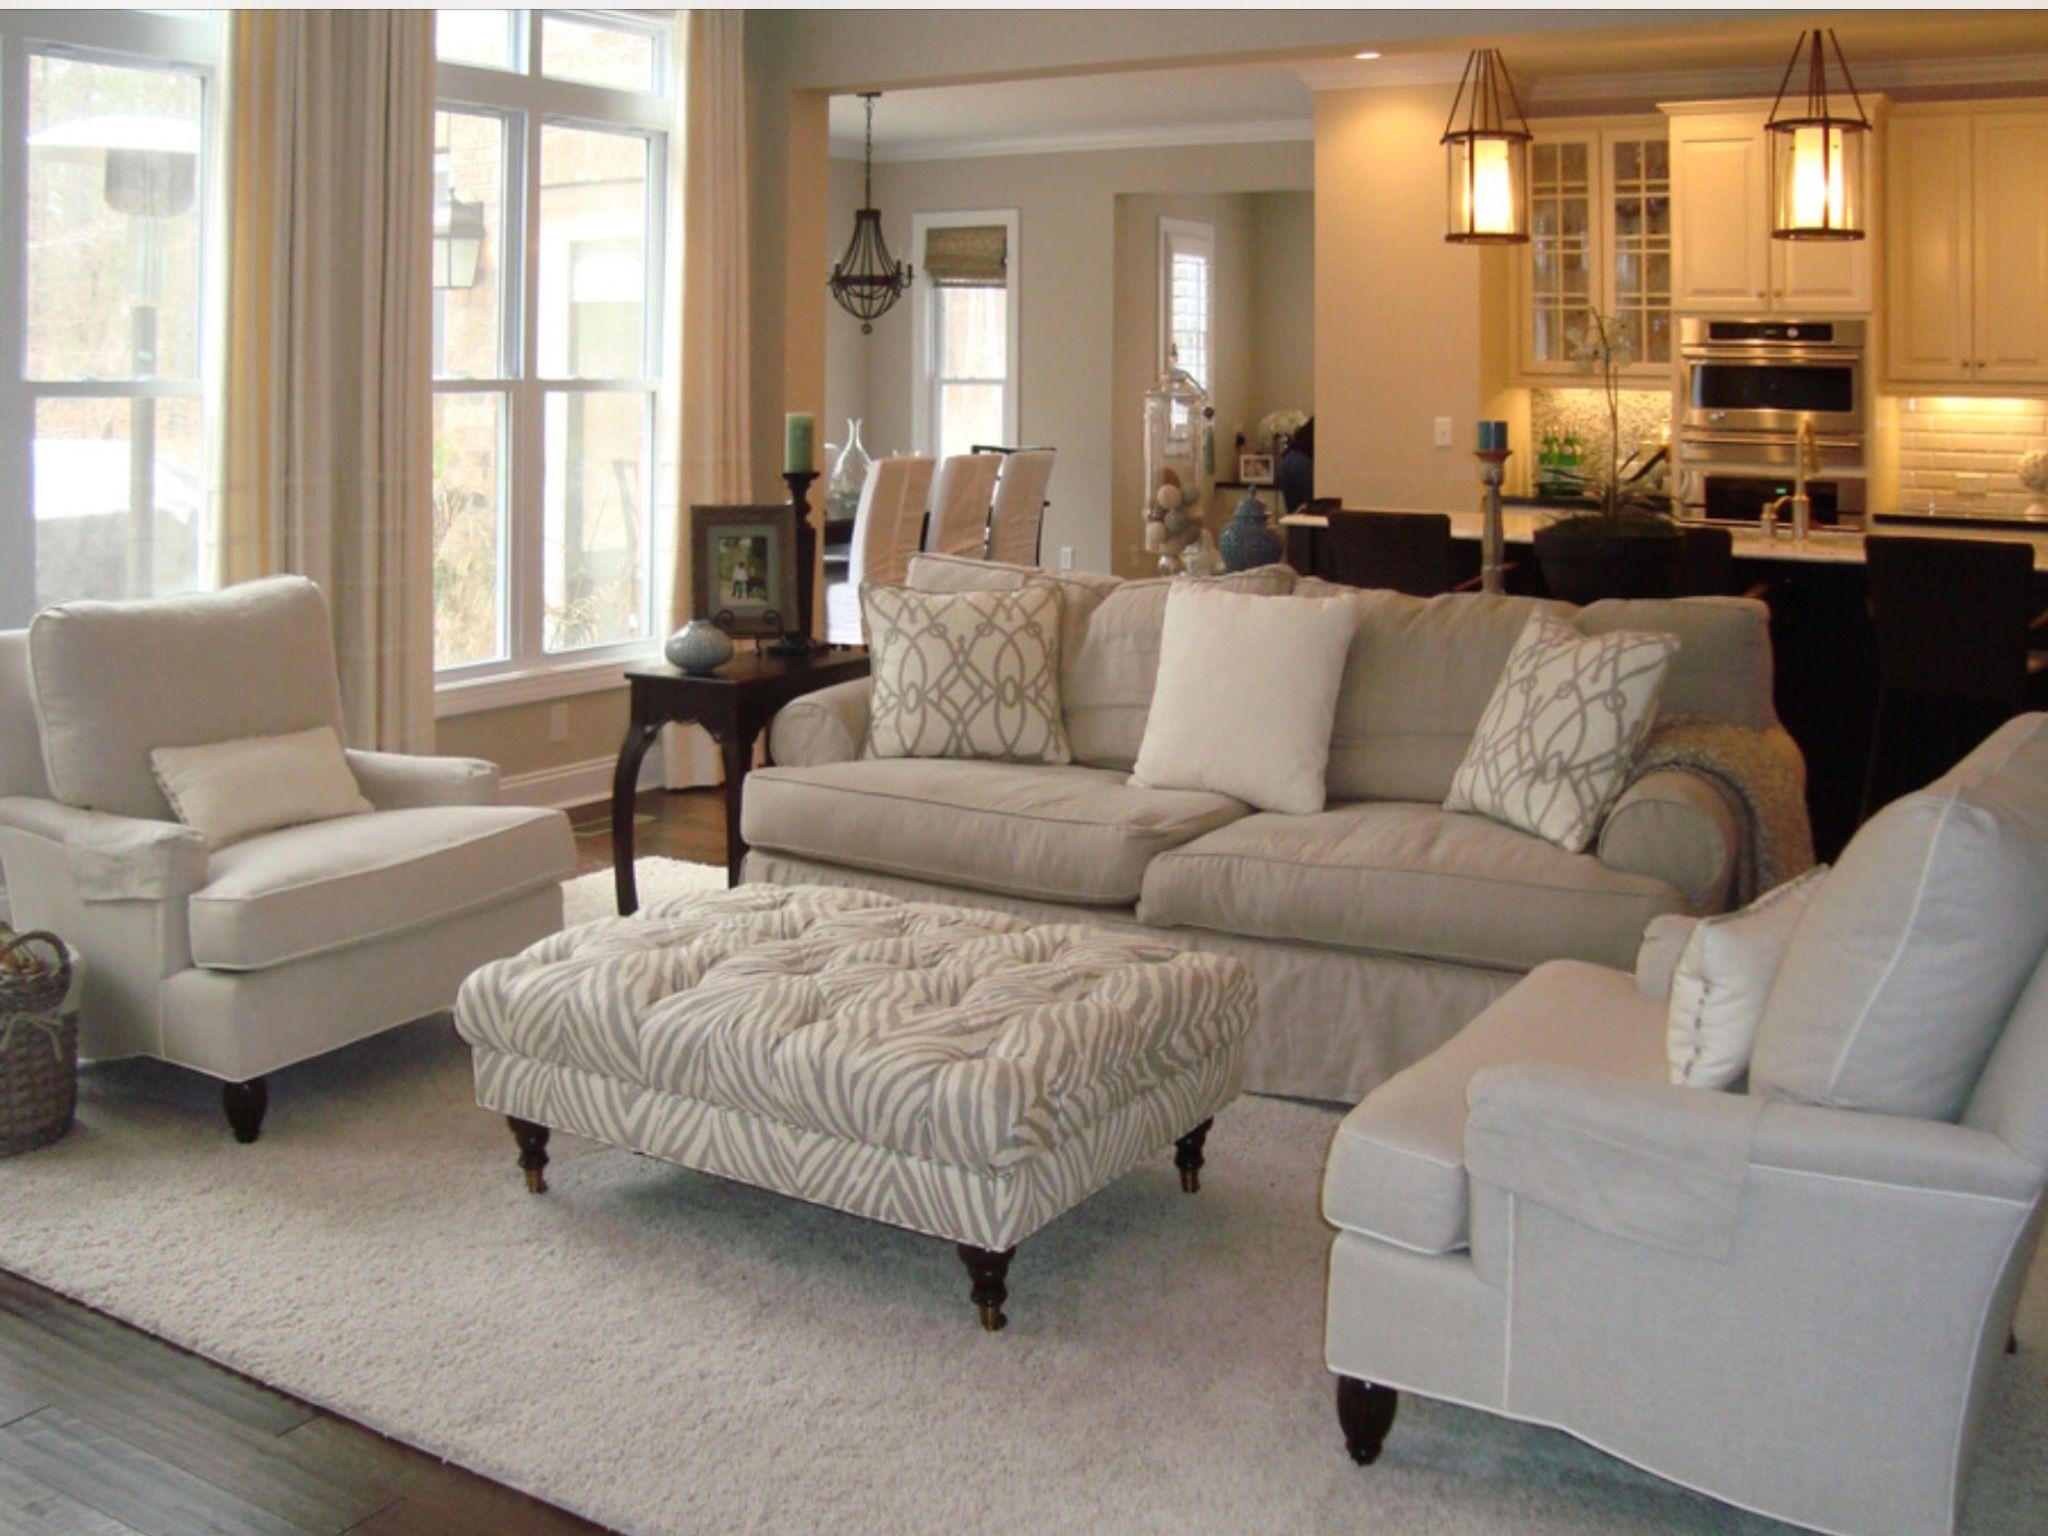 Formal living - tufted ottoman | Decor ideas in 2019 | Cream ...